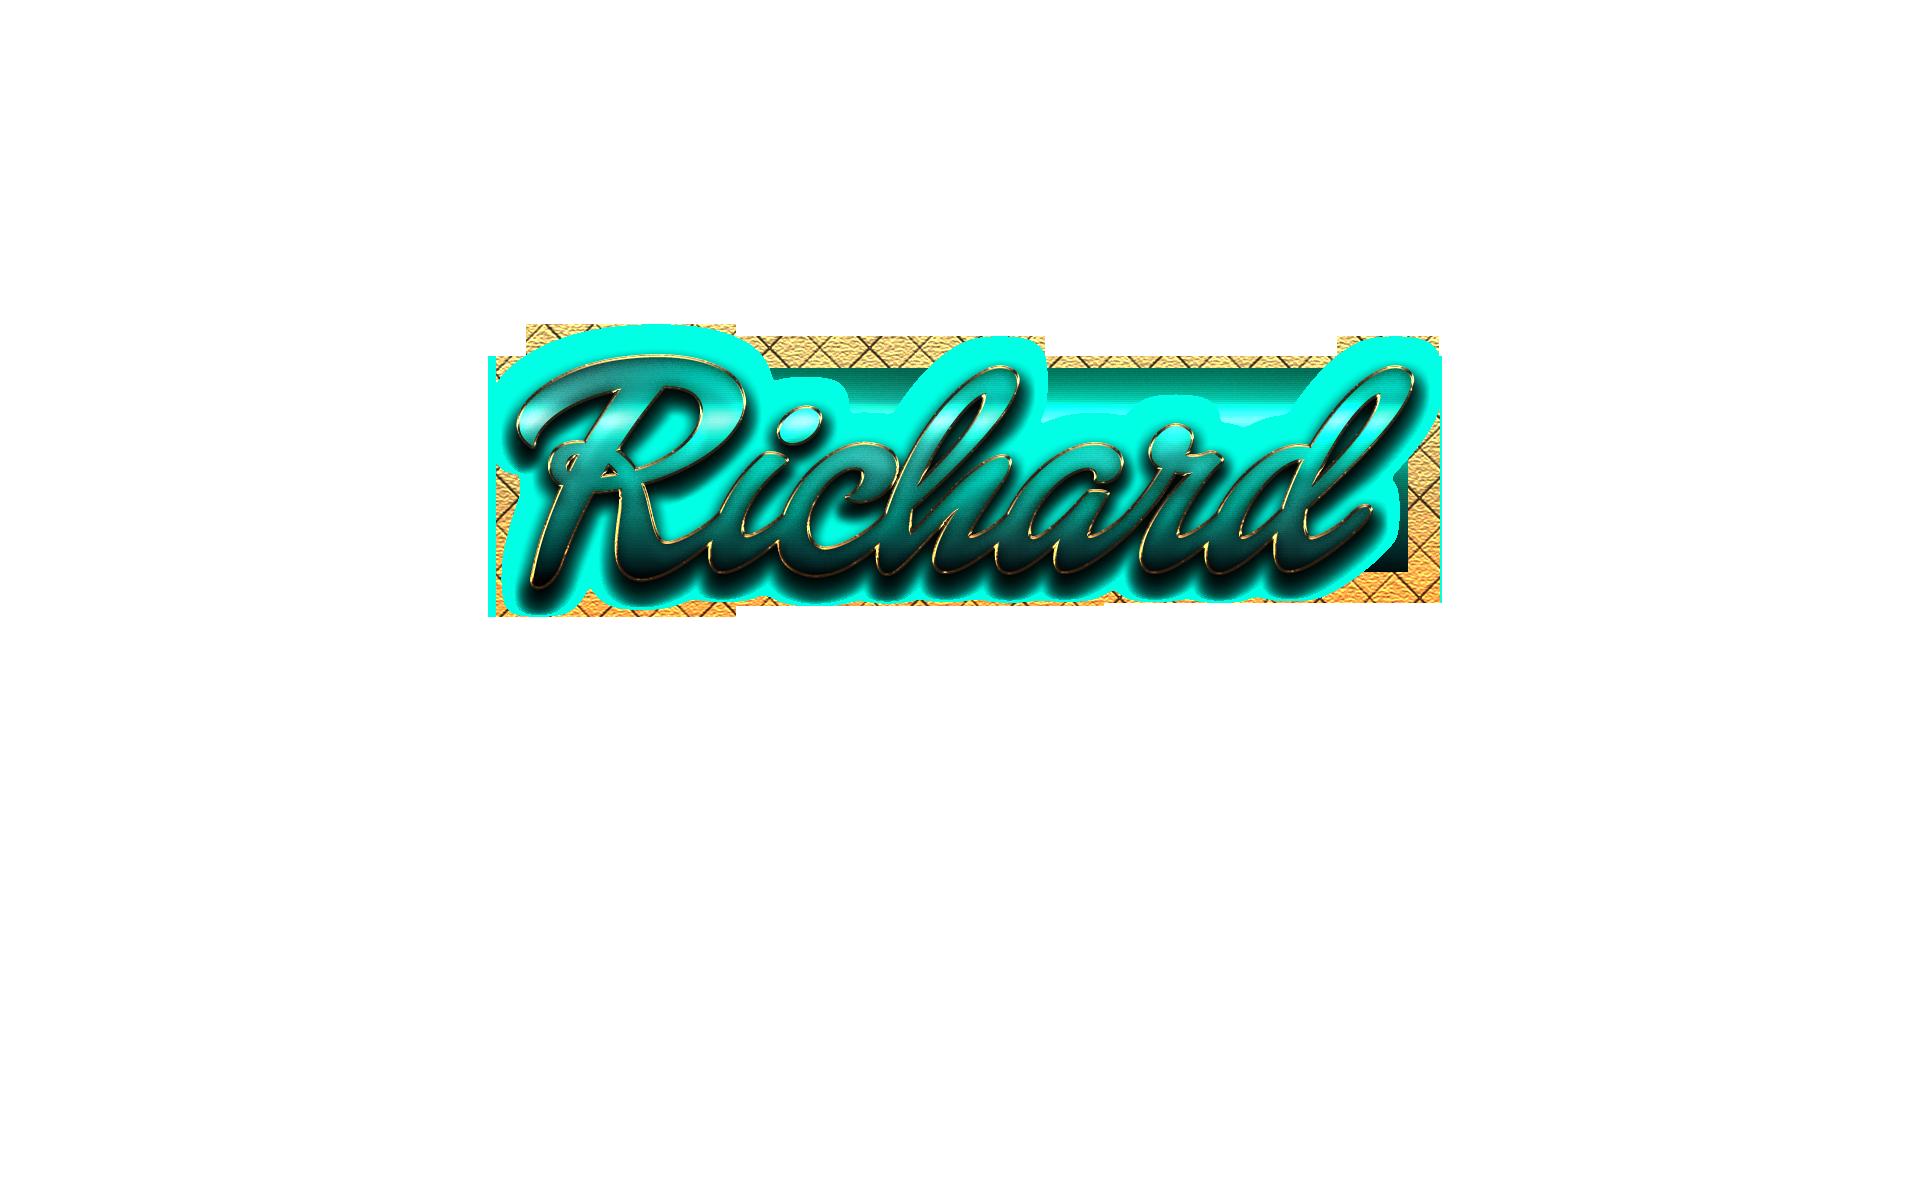 Richard PNG Transparent Images Free Download.